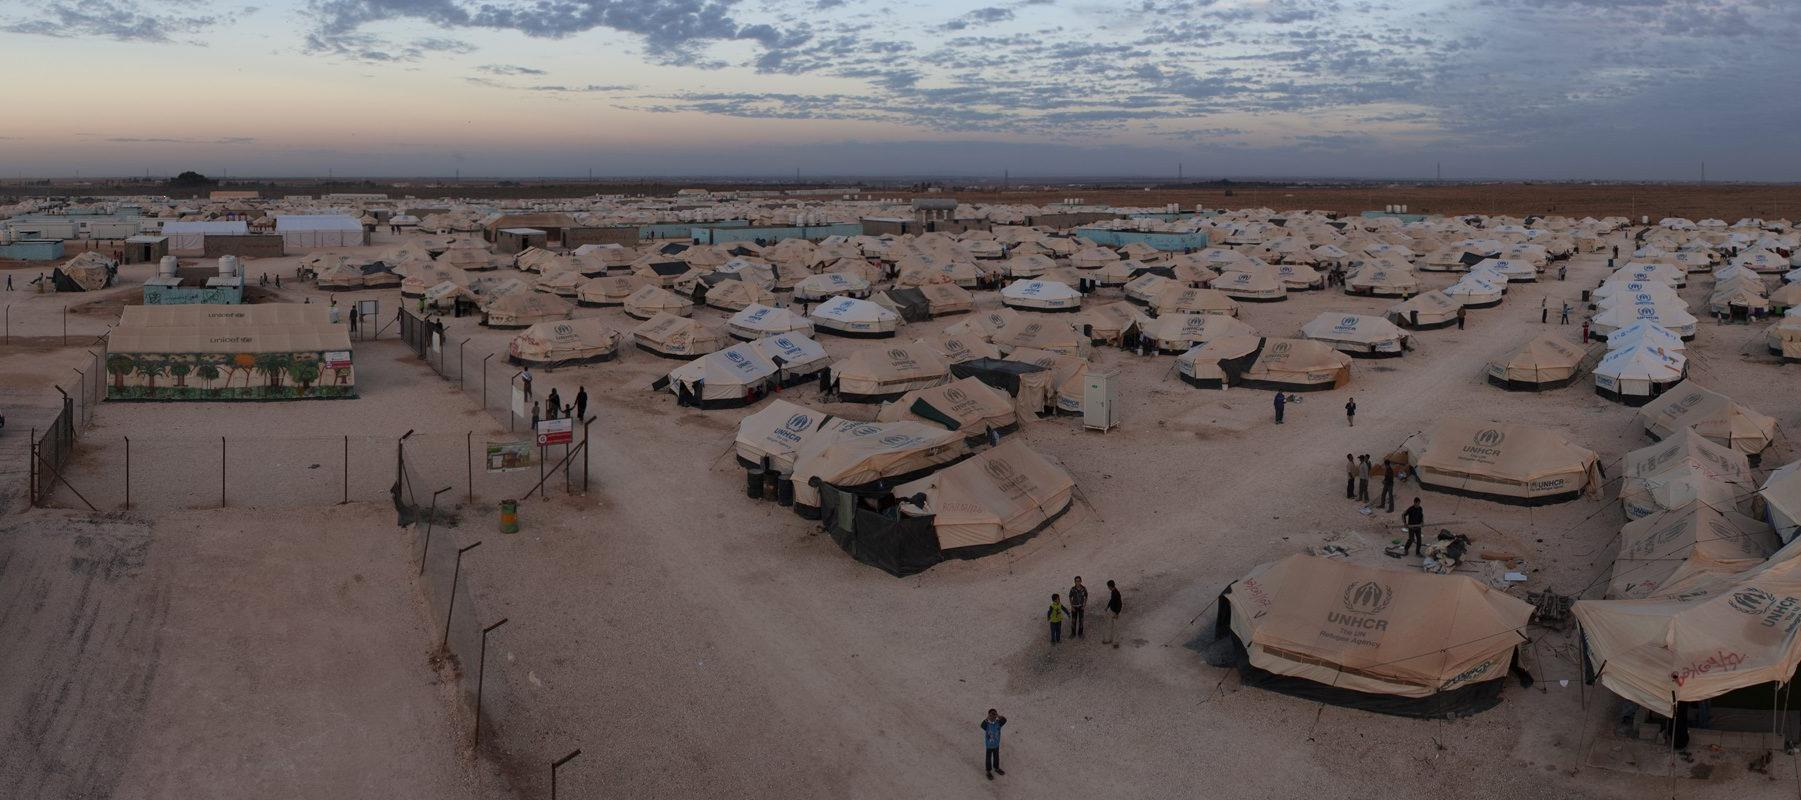 An aerial view of the Za'atari Refugee Camp in Jordan. Panorama taken on 21 November, 2012.